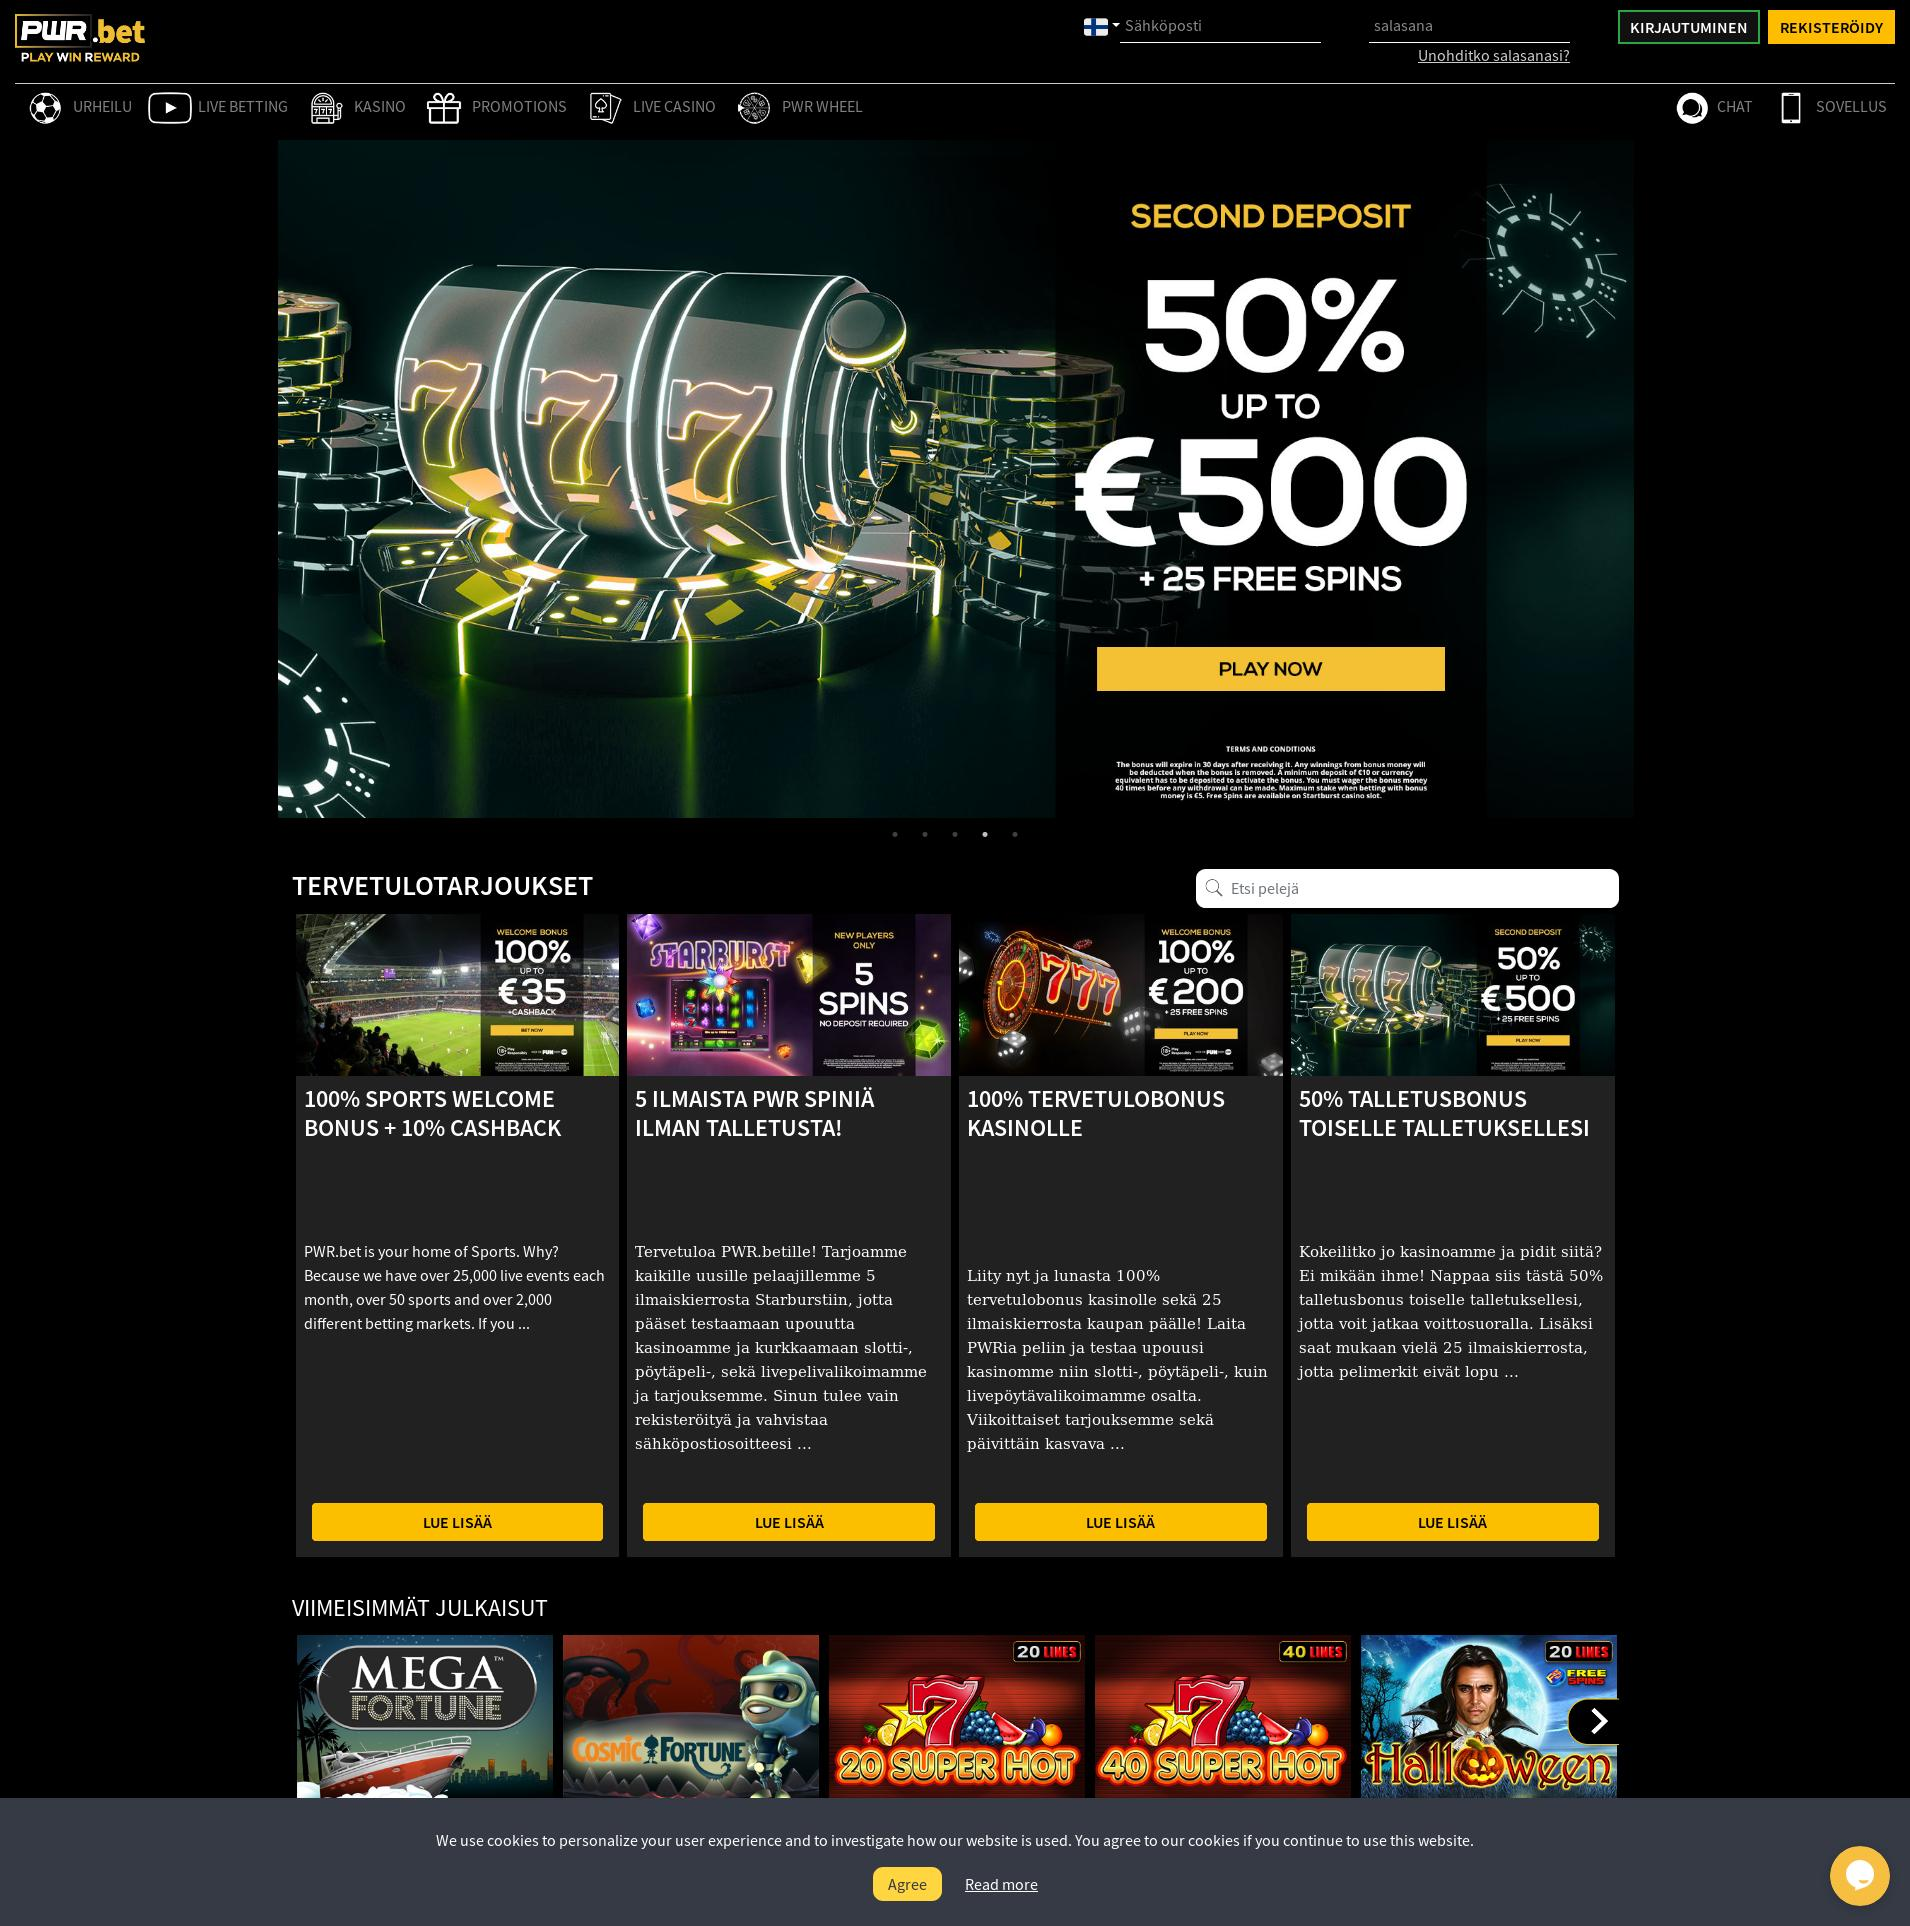 Casino screen Lobby 2019-06-24 for Finland